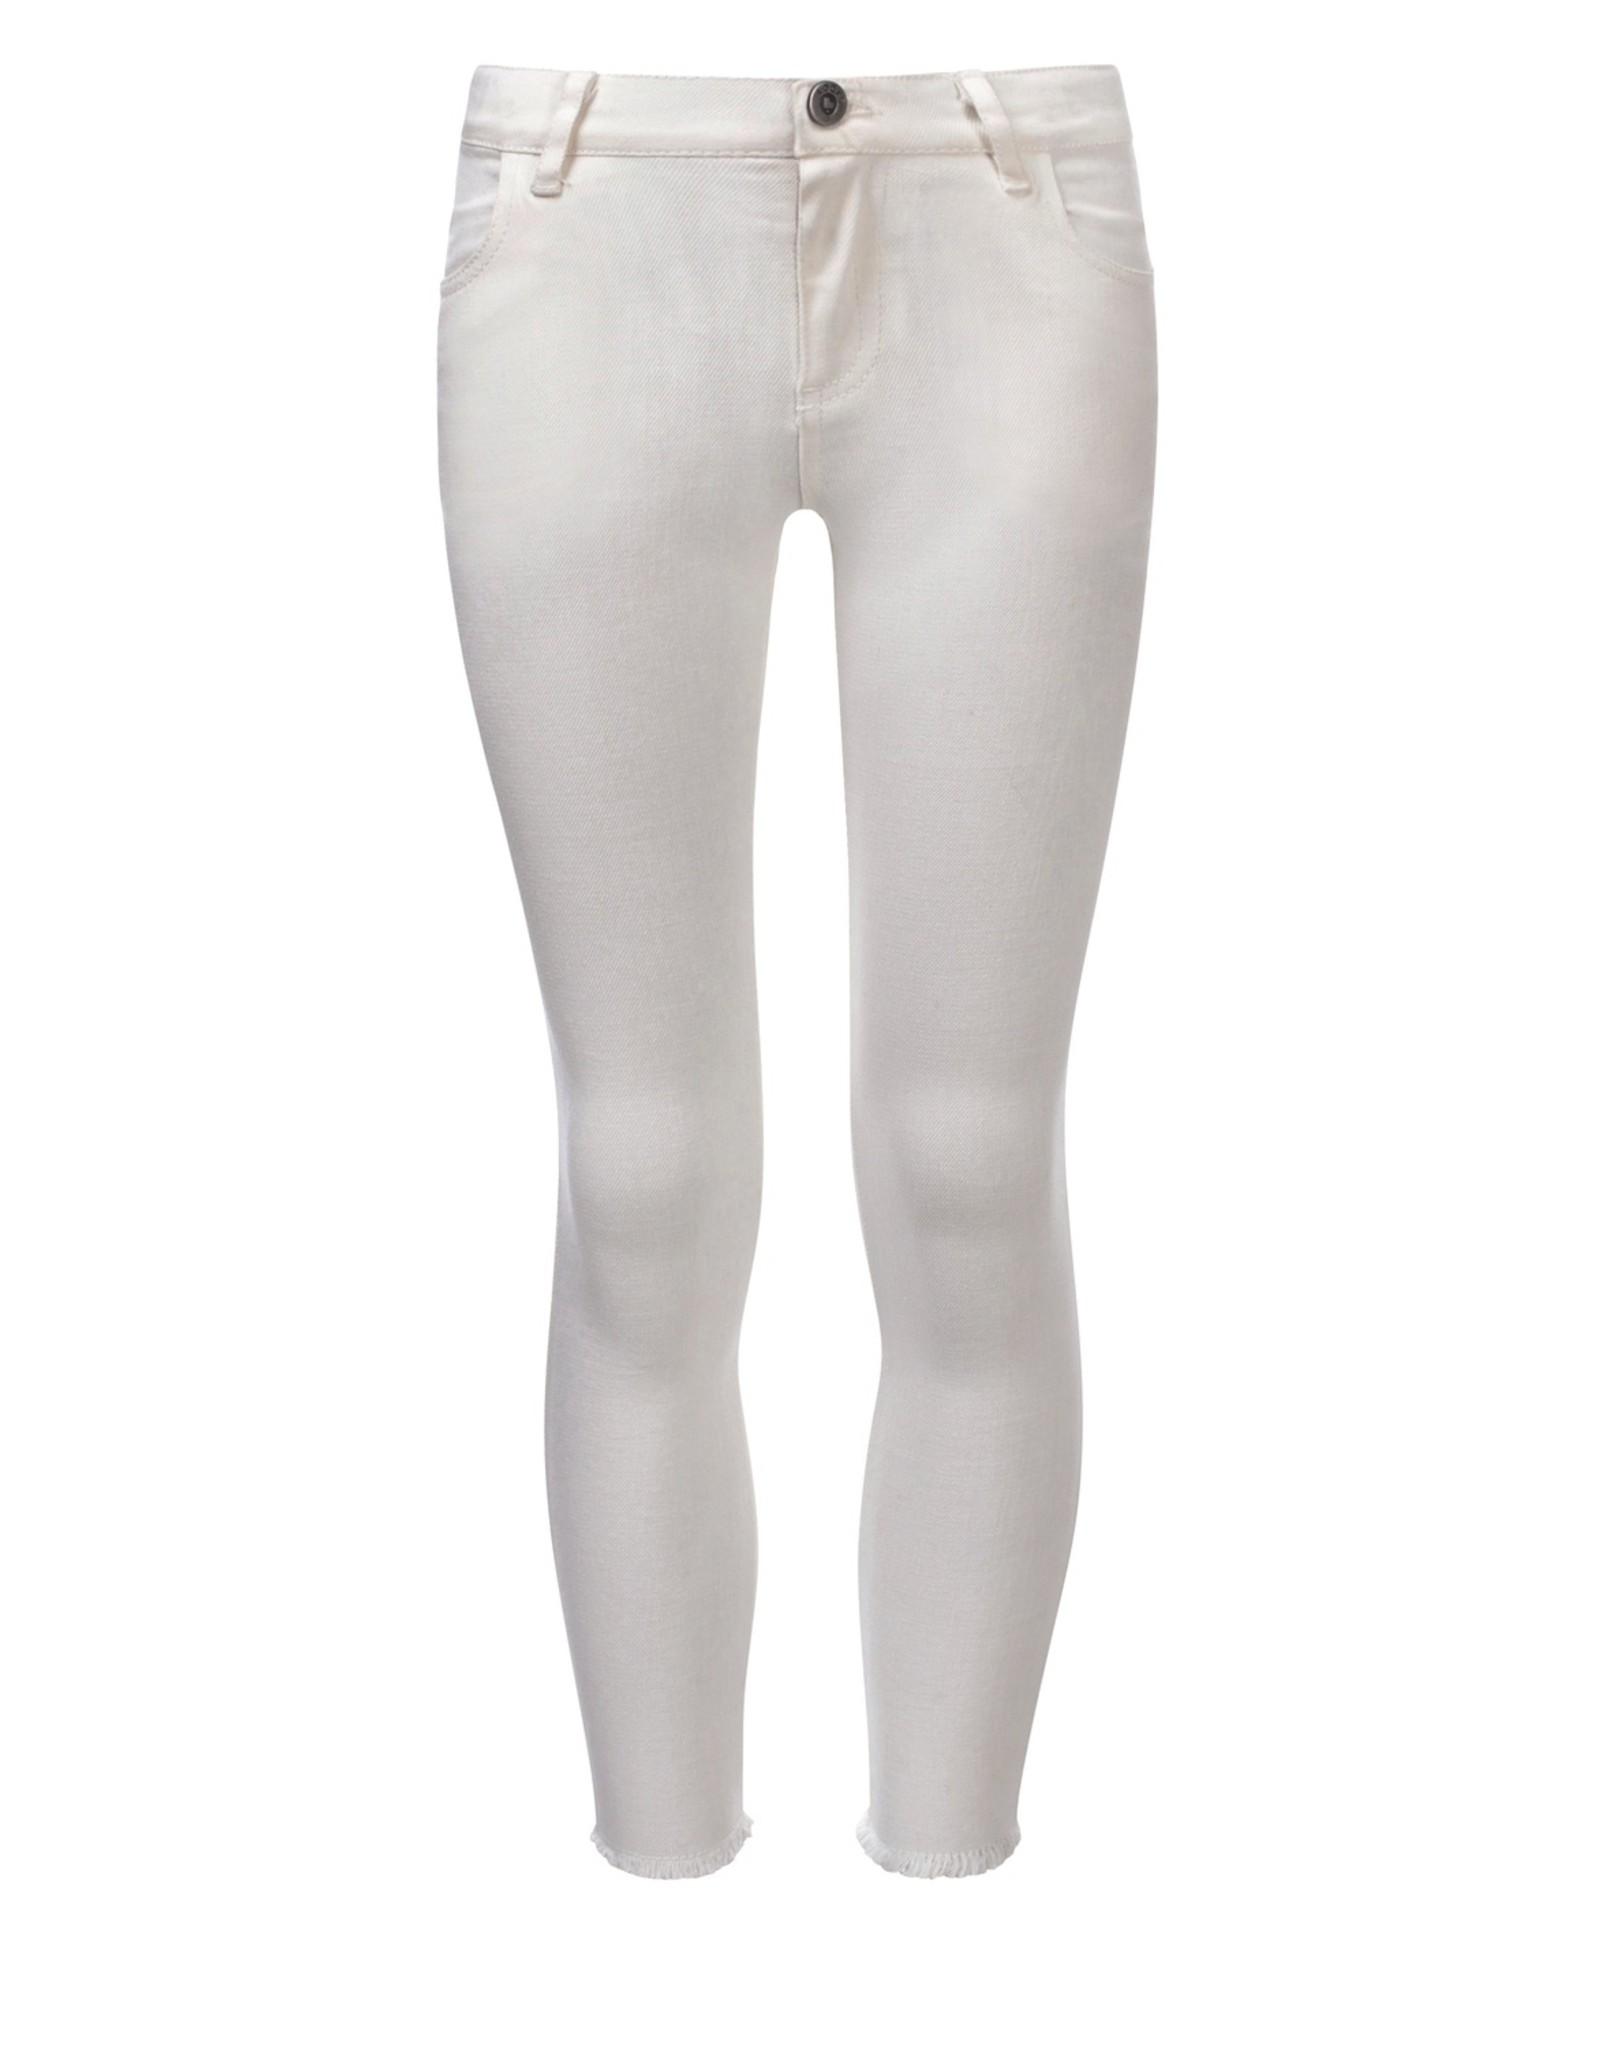 Looxs Girls white denim skinny off white